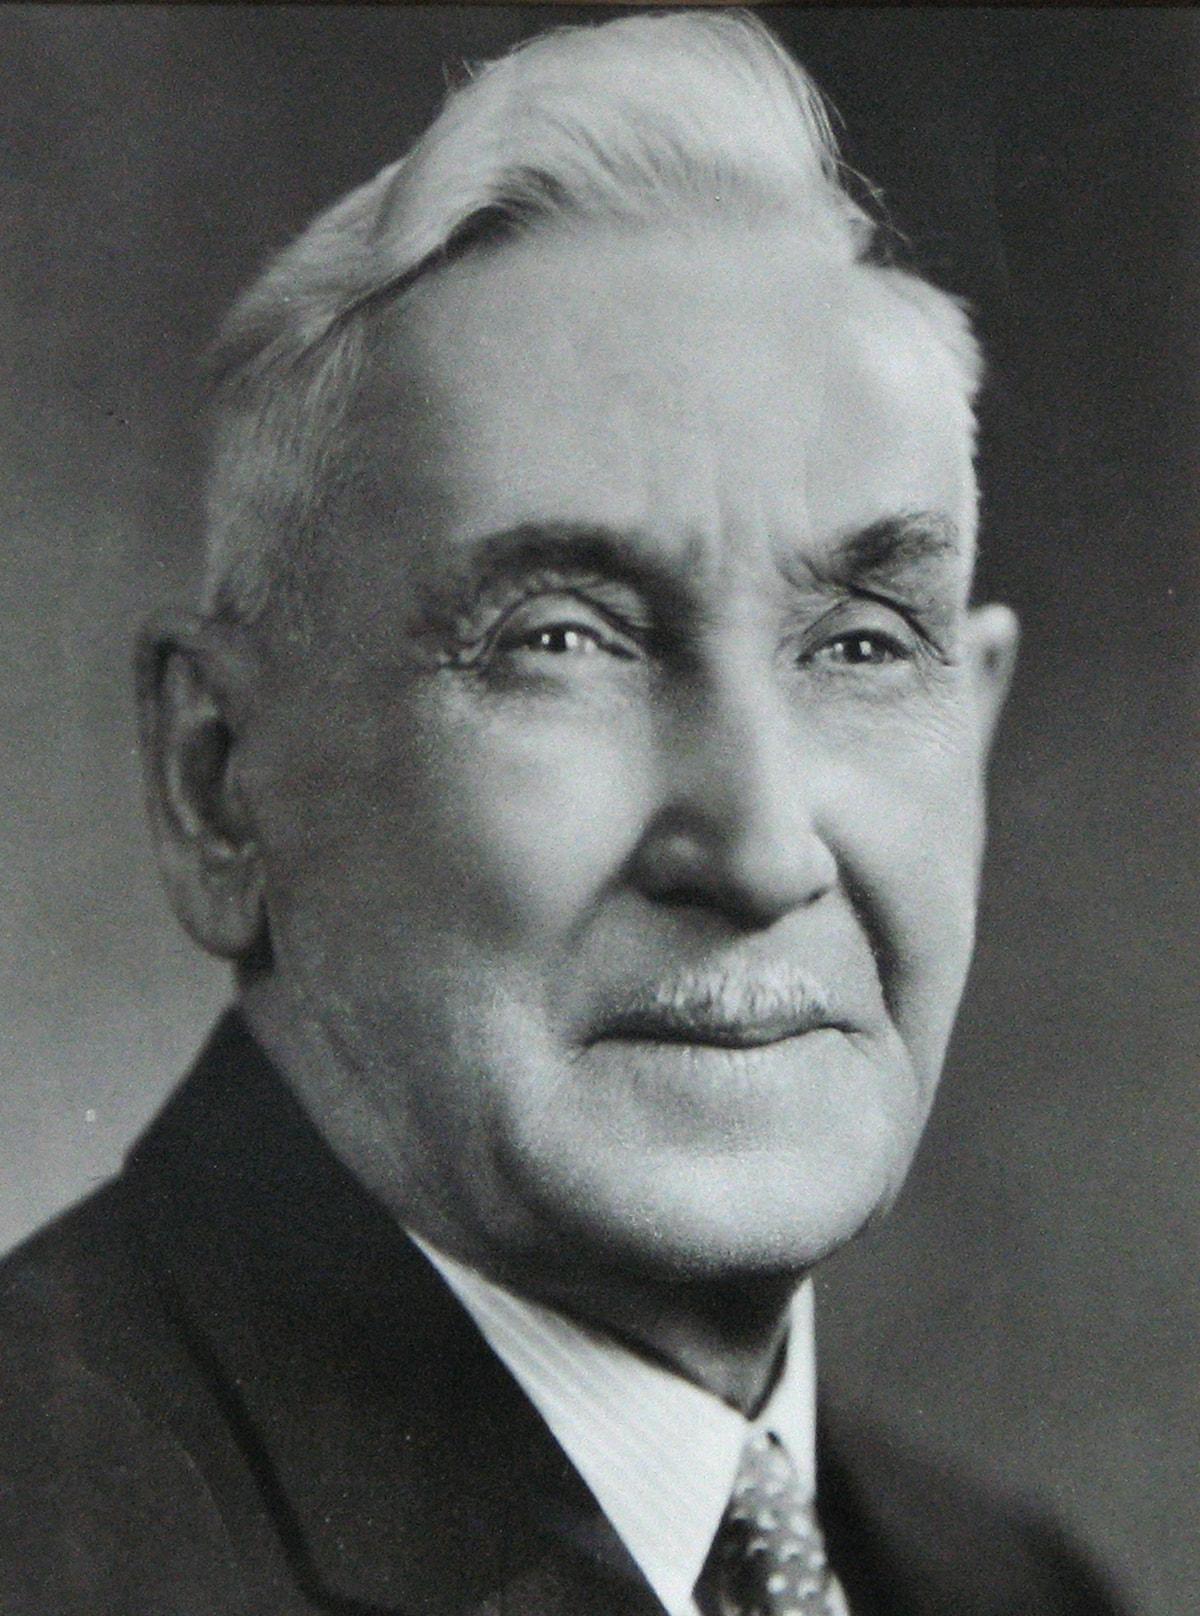 Mayor Donald Fletcher